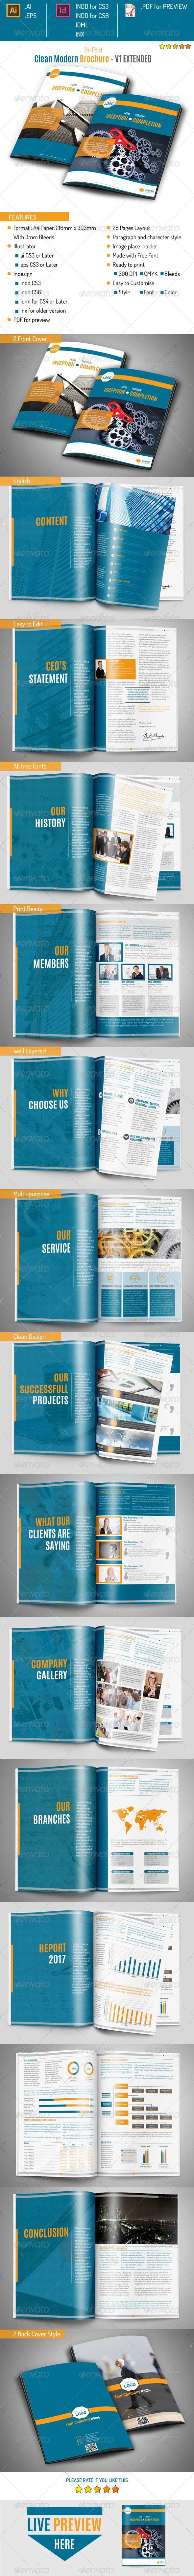 Clean Moderm Brochure v1 Extended - Corporate Brochures